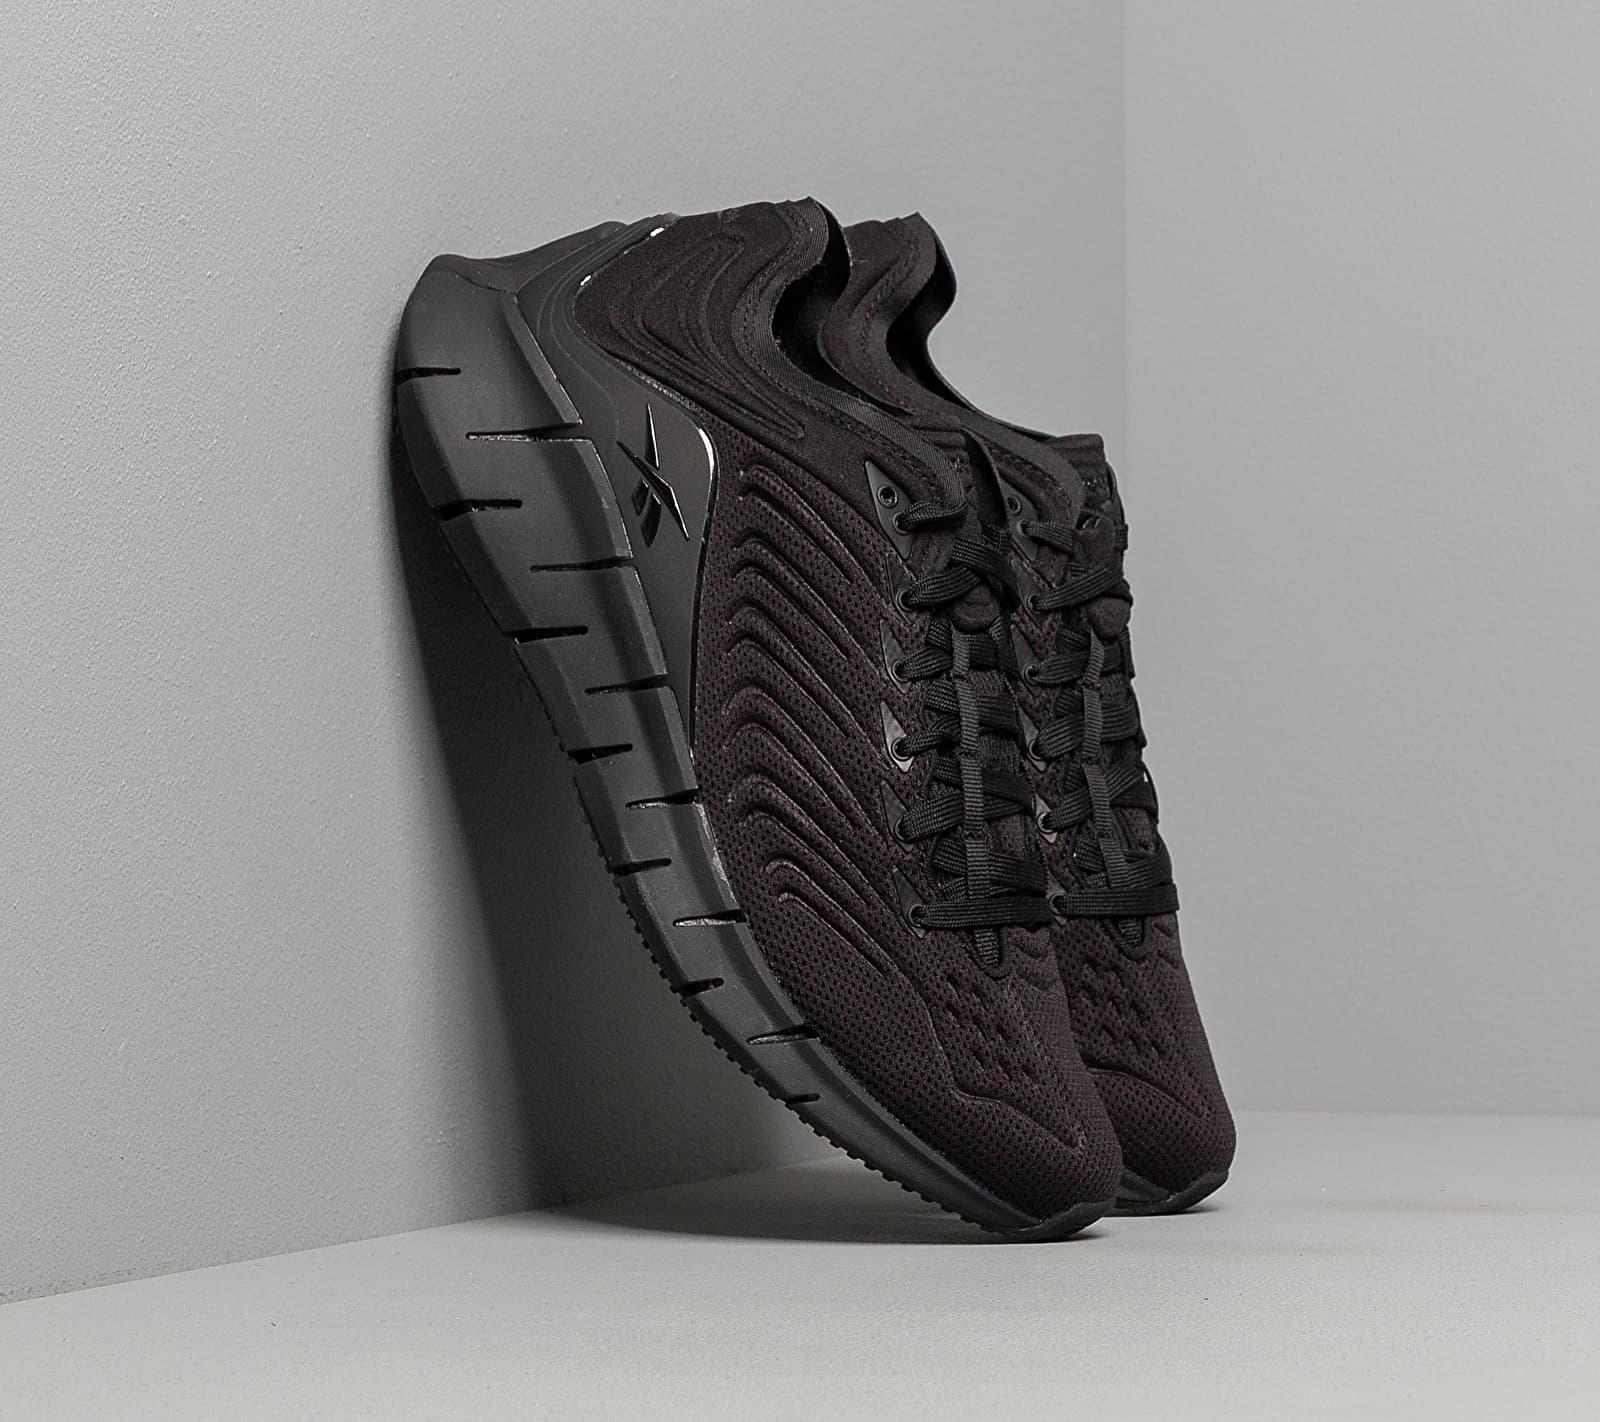 Reebok Zig Kinetica Black/ Black/ True Grey 7 EUR 40.5